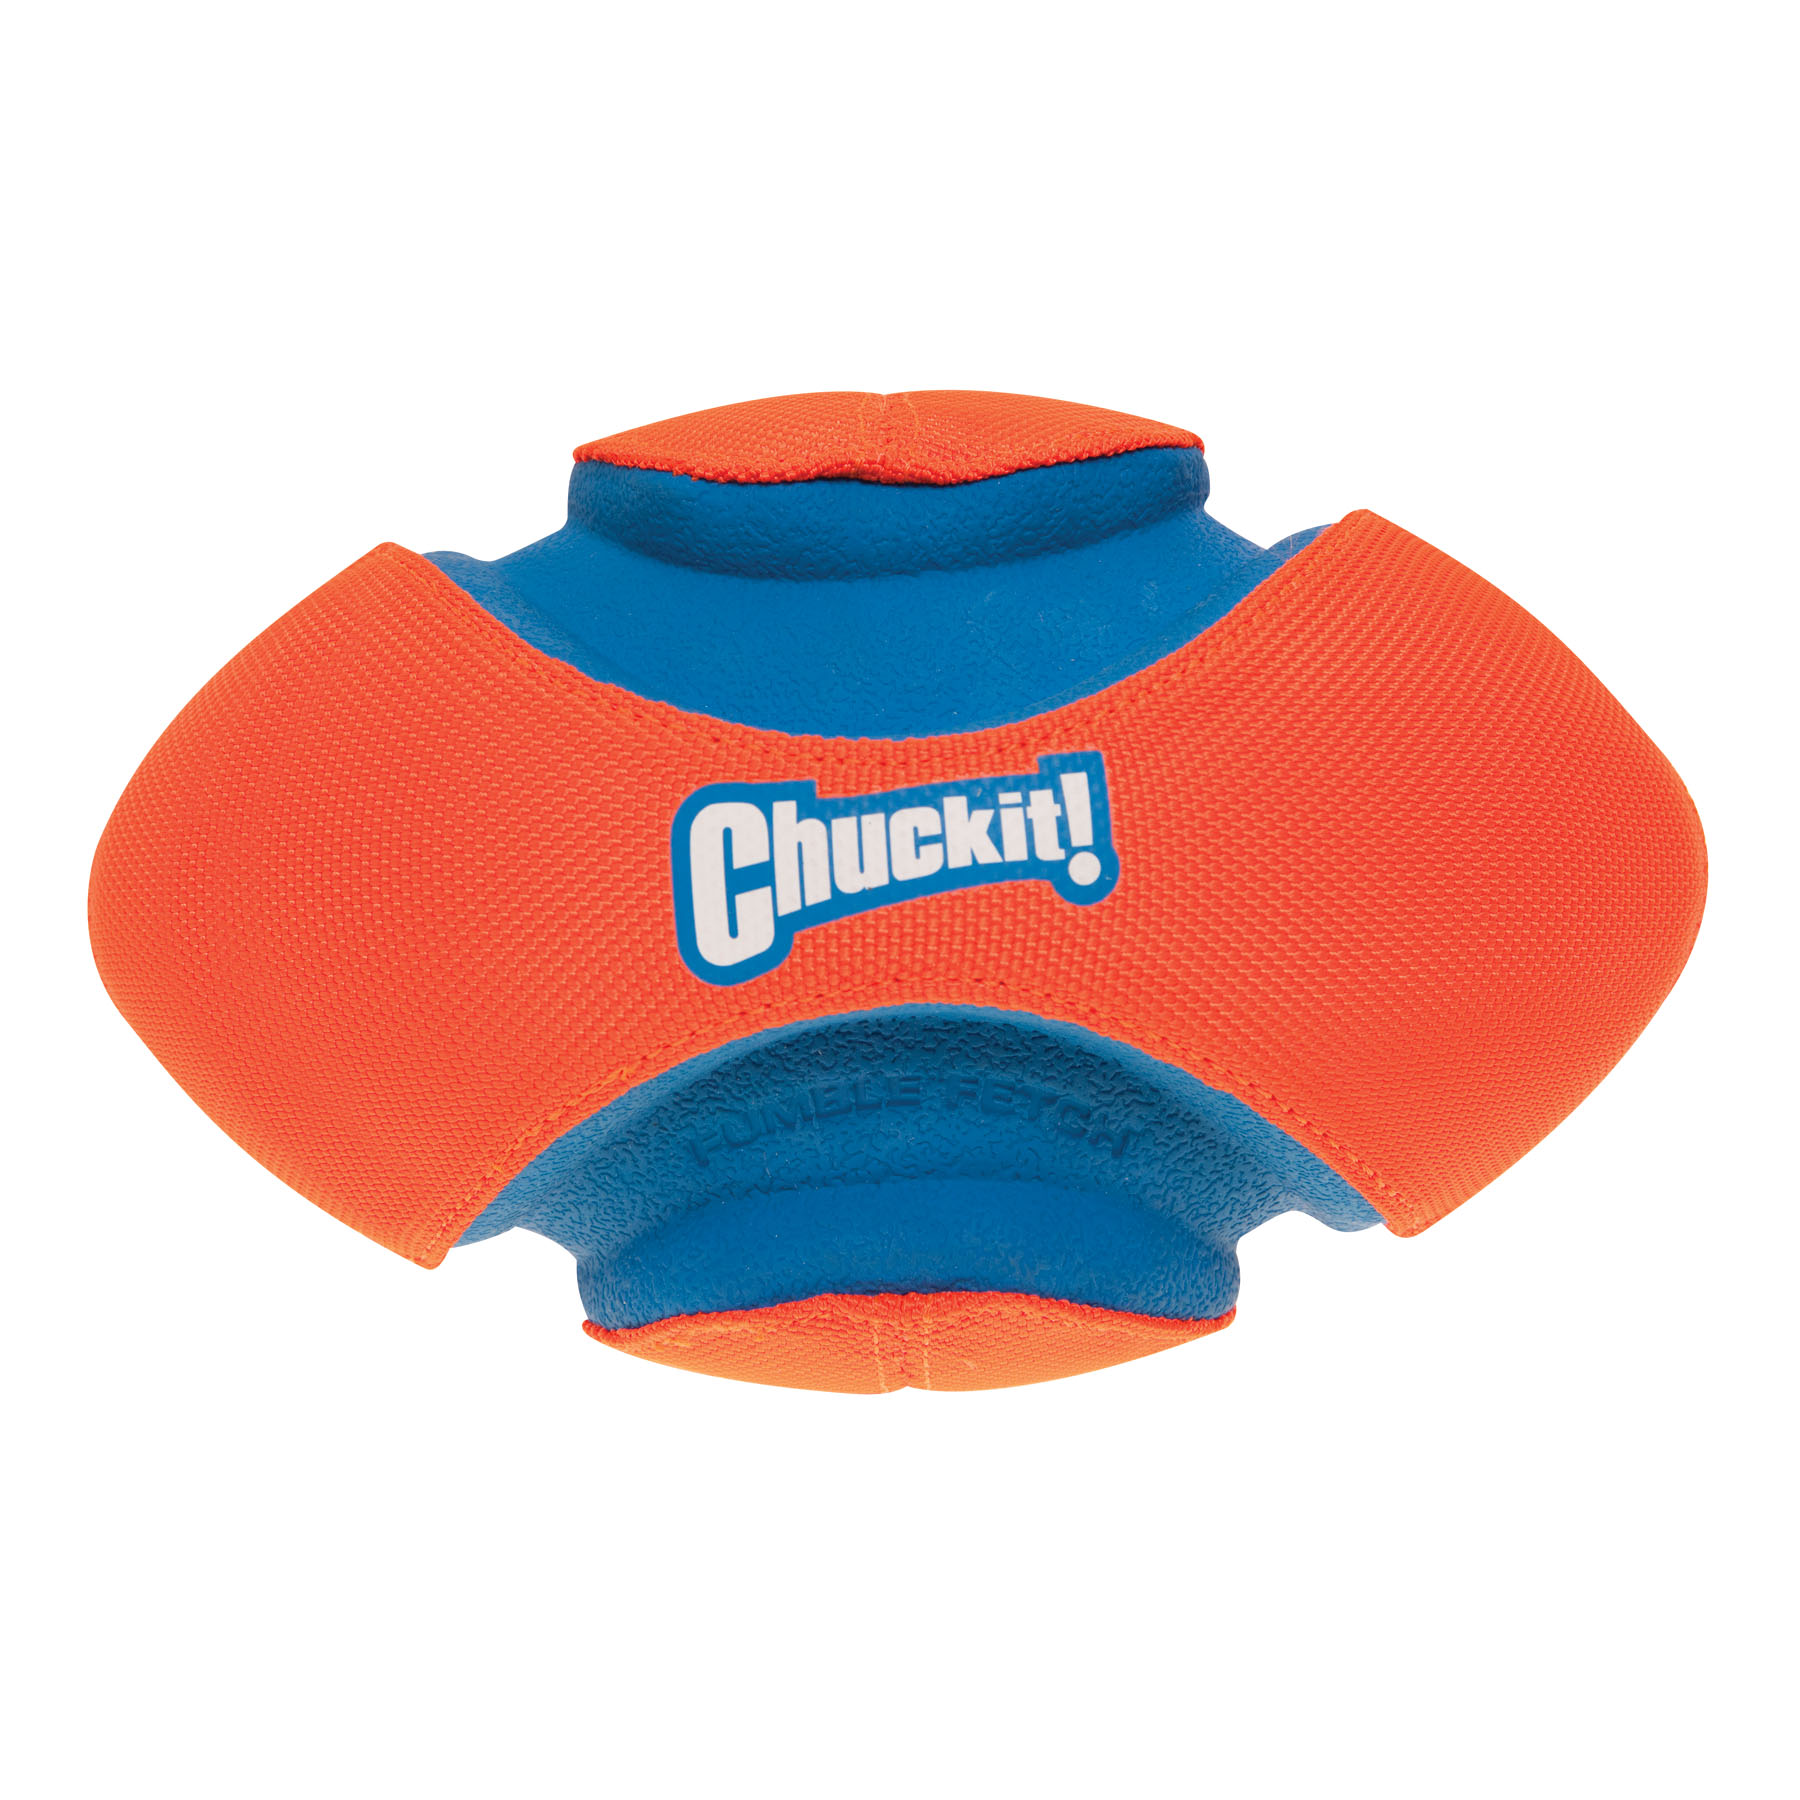 Chuckit! Fumble Fetch Dog toy, Small